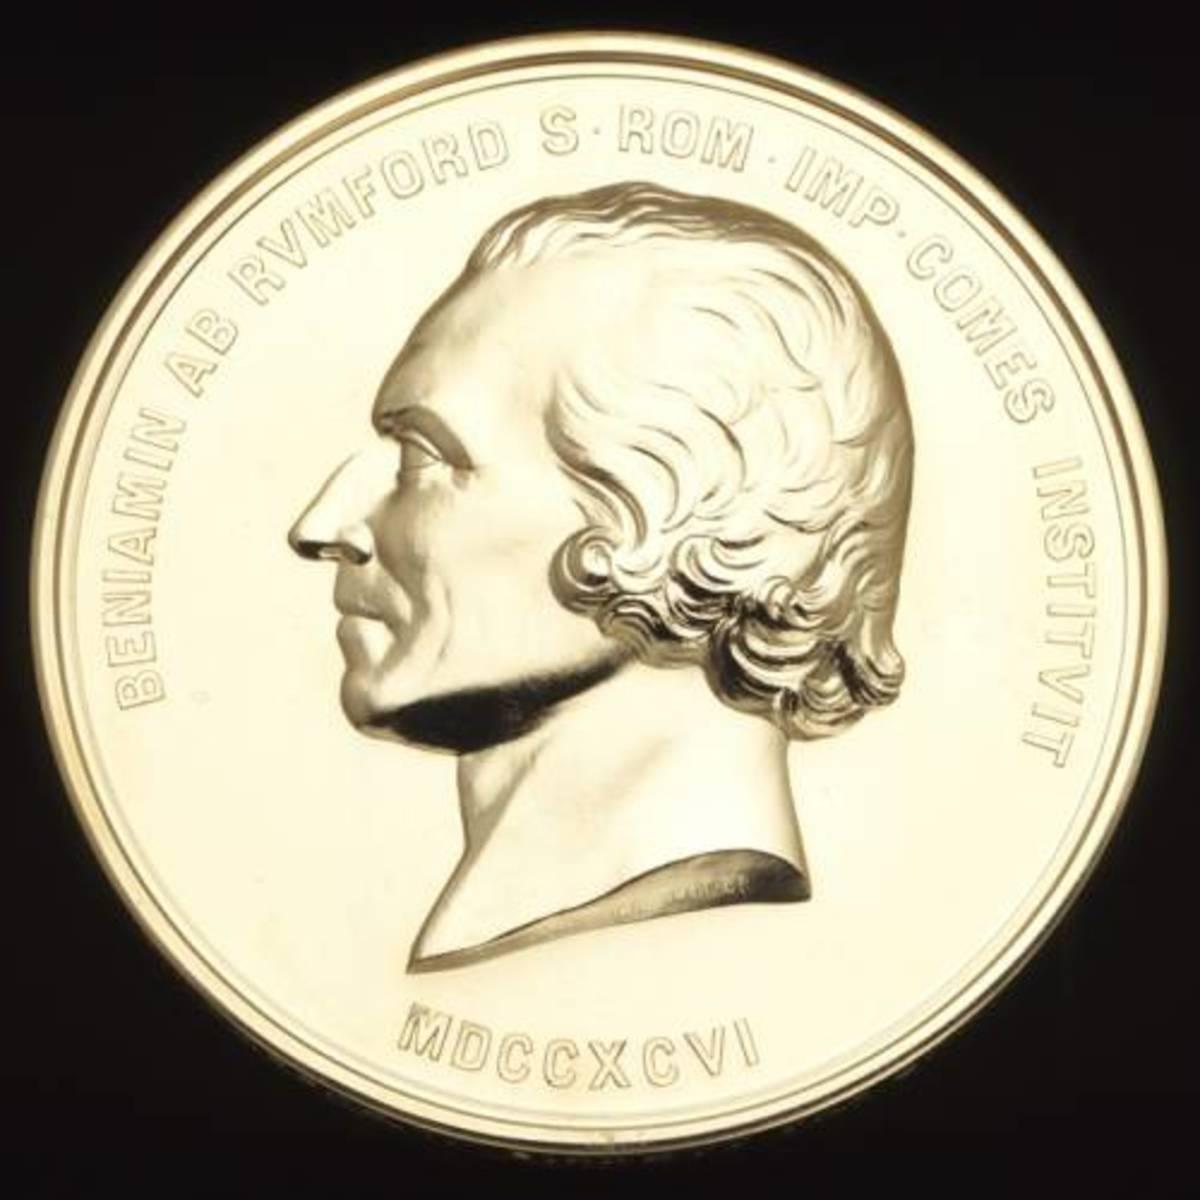 A modern Rumford medal.